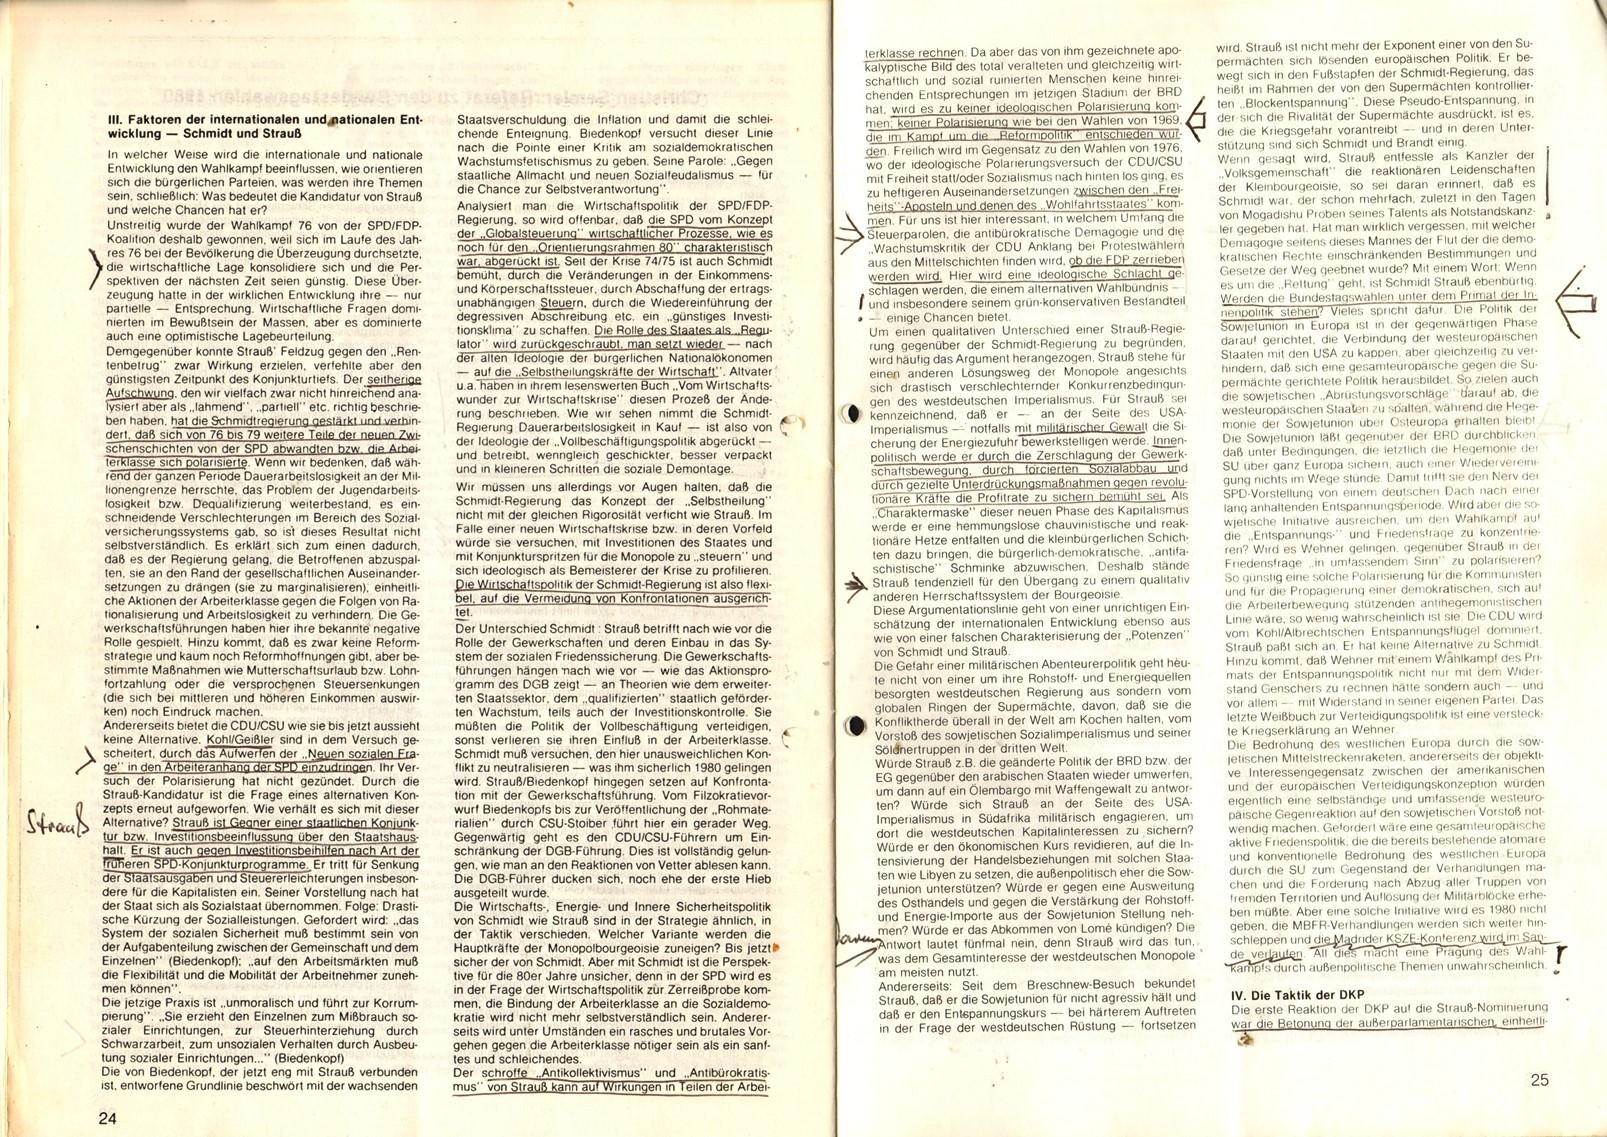 KPDAO_1979_Diskussion_Bundestagswahlen_1980_13